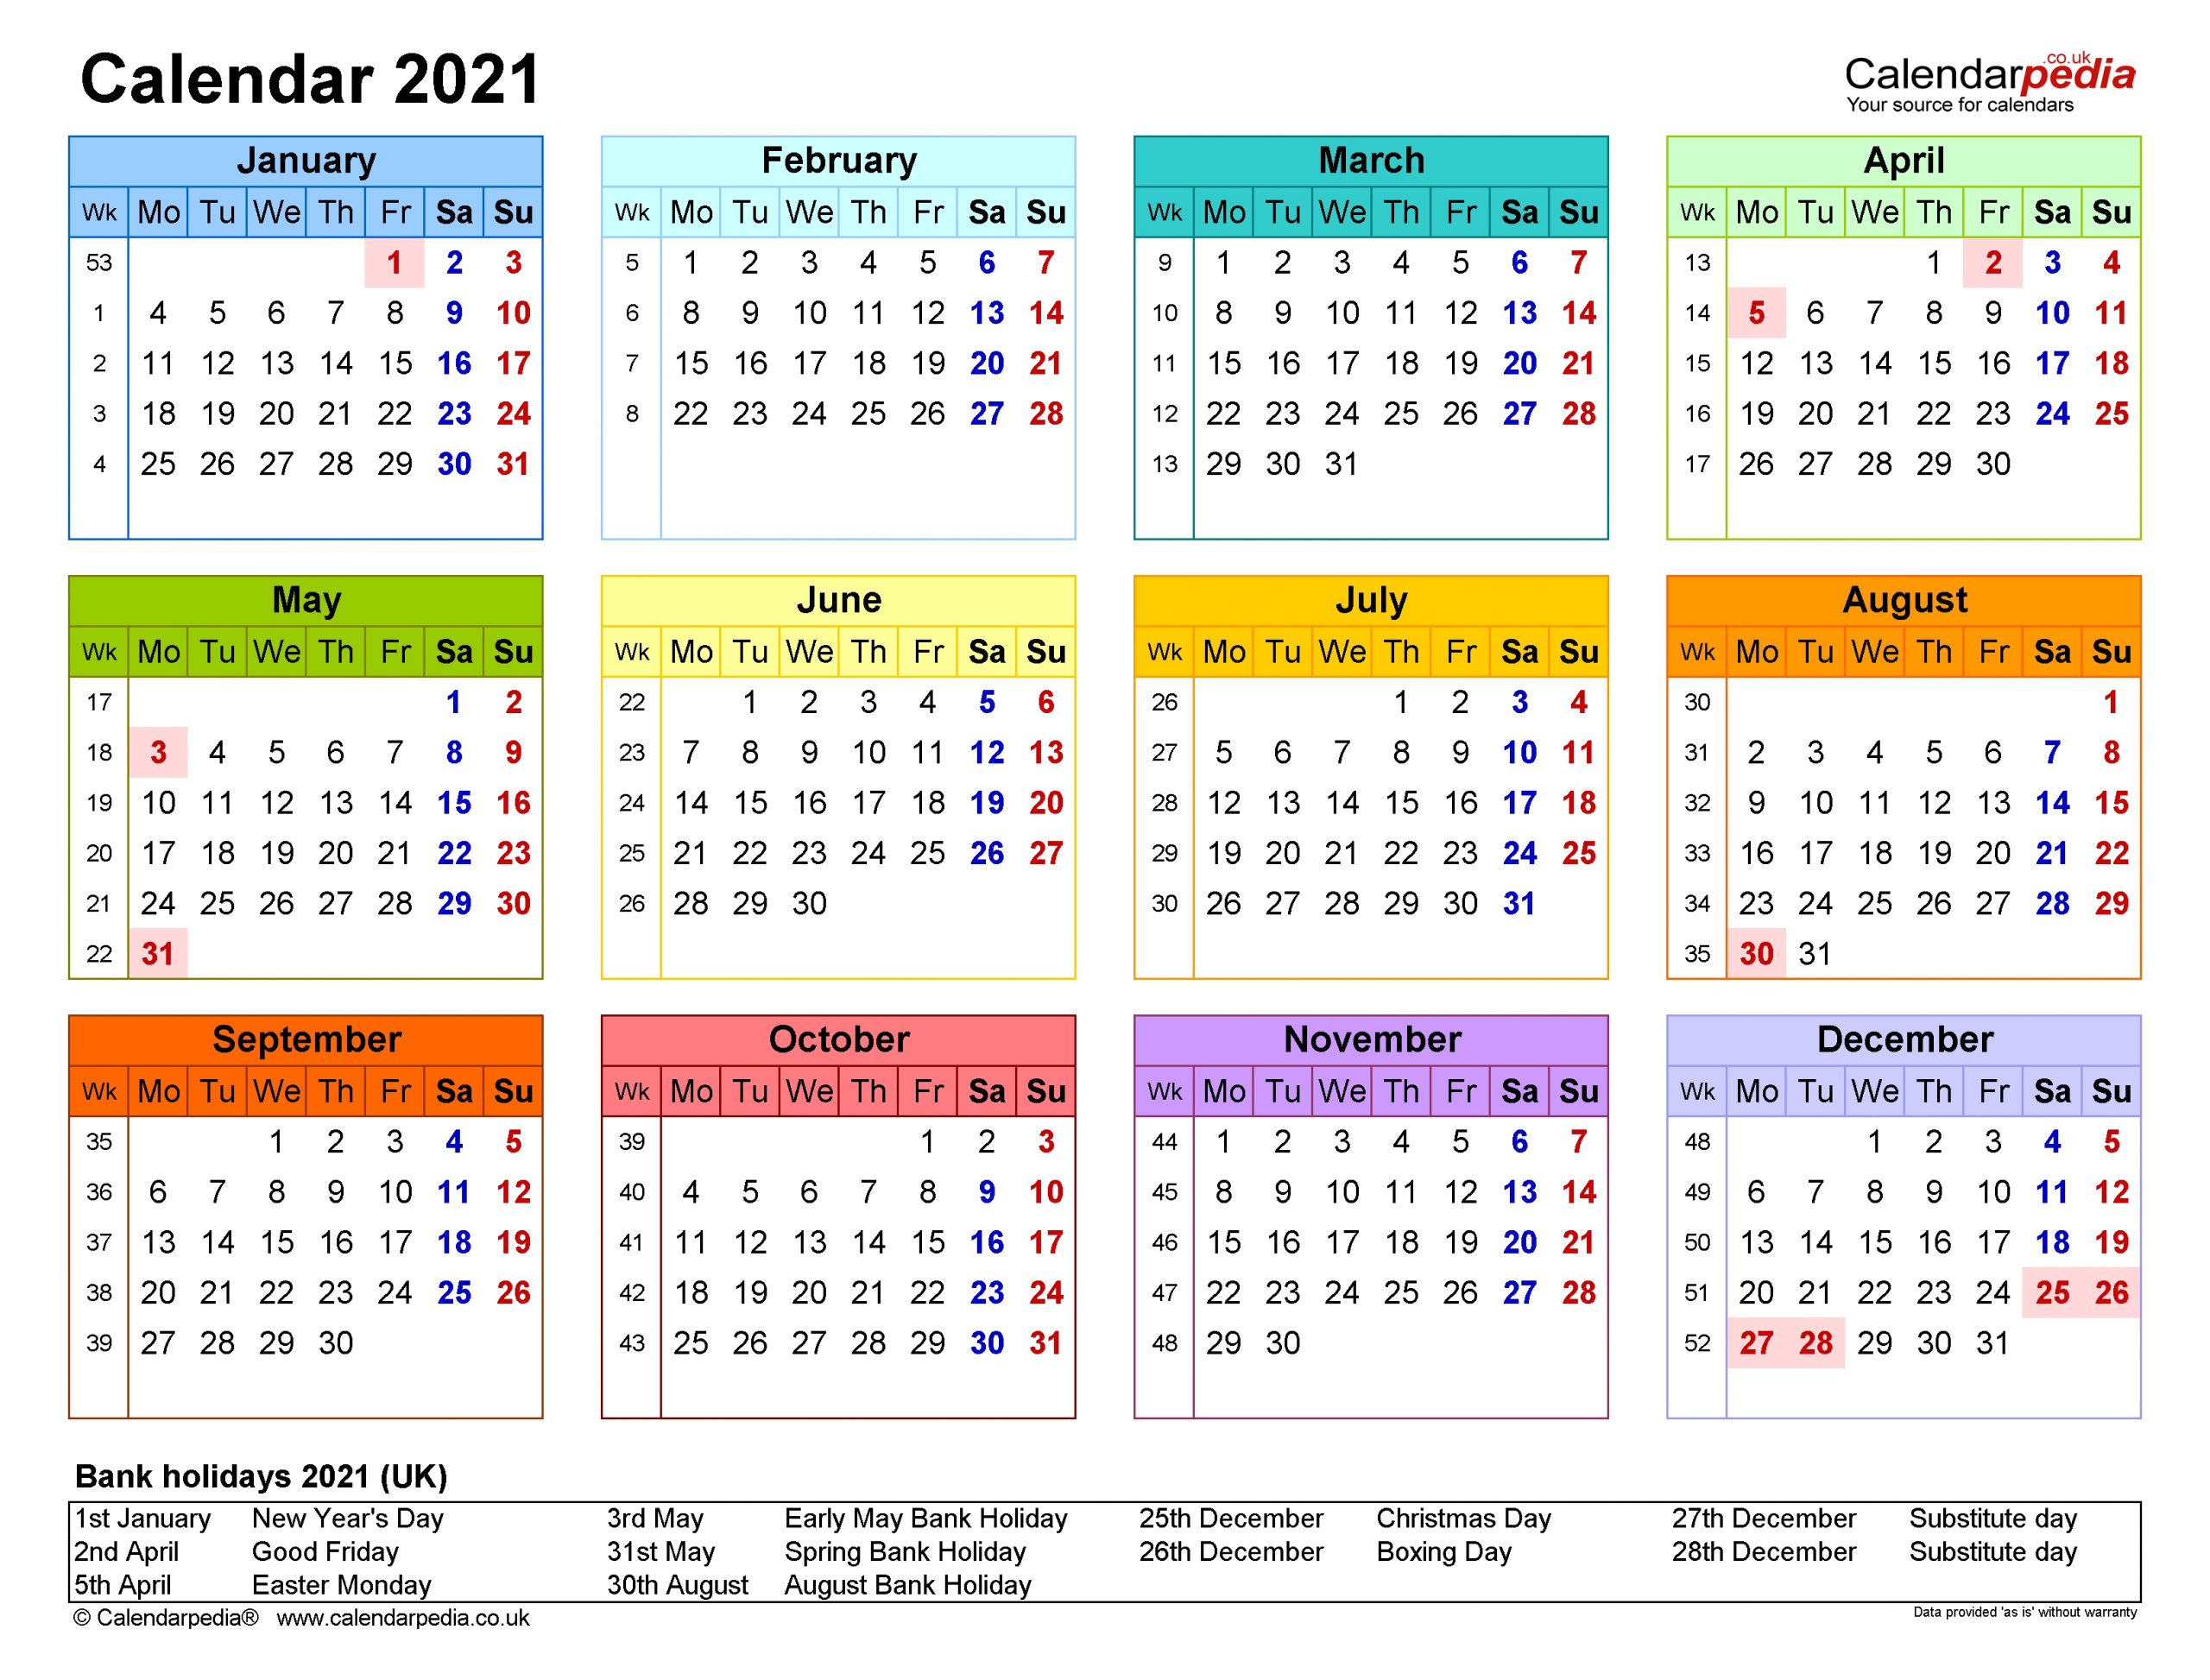 Calendar 2021 (Uk) - Free Printable Pdf Templates regarding One Page2021 Calendar Printable Images Image